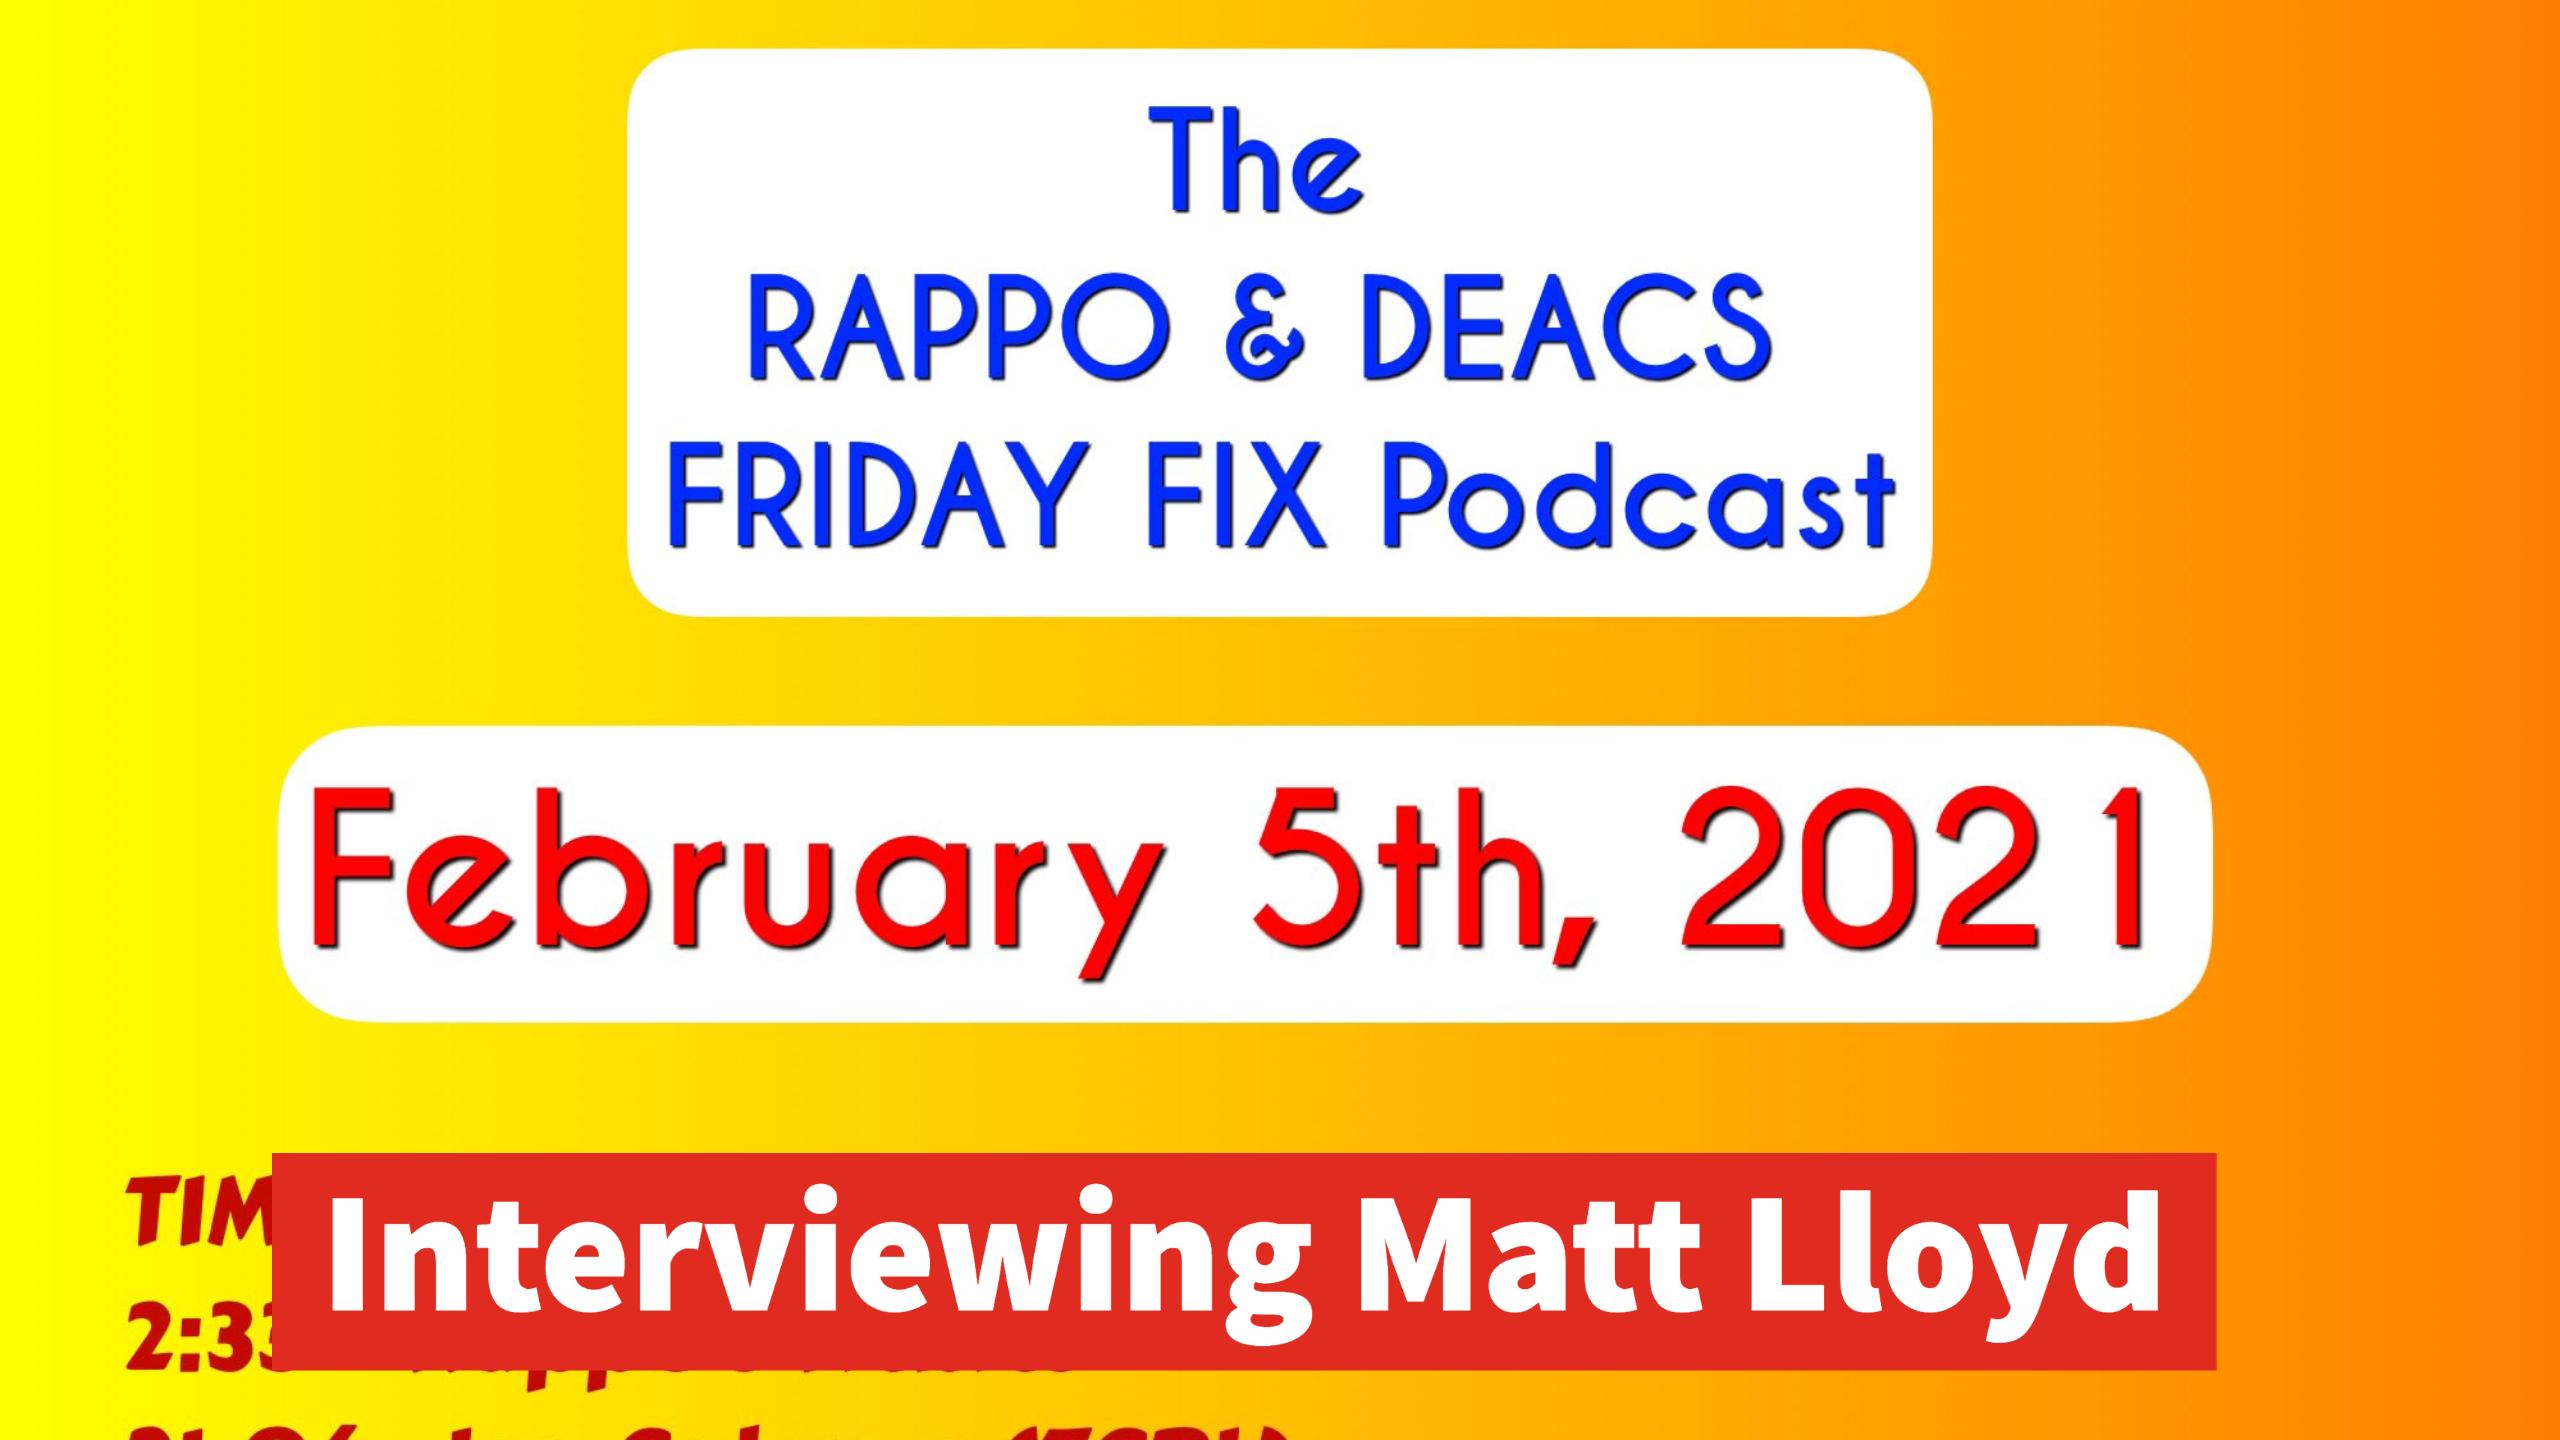 Rappo & Deacs Friday Fix - Interviewing Matt Lloyd